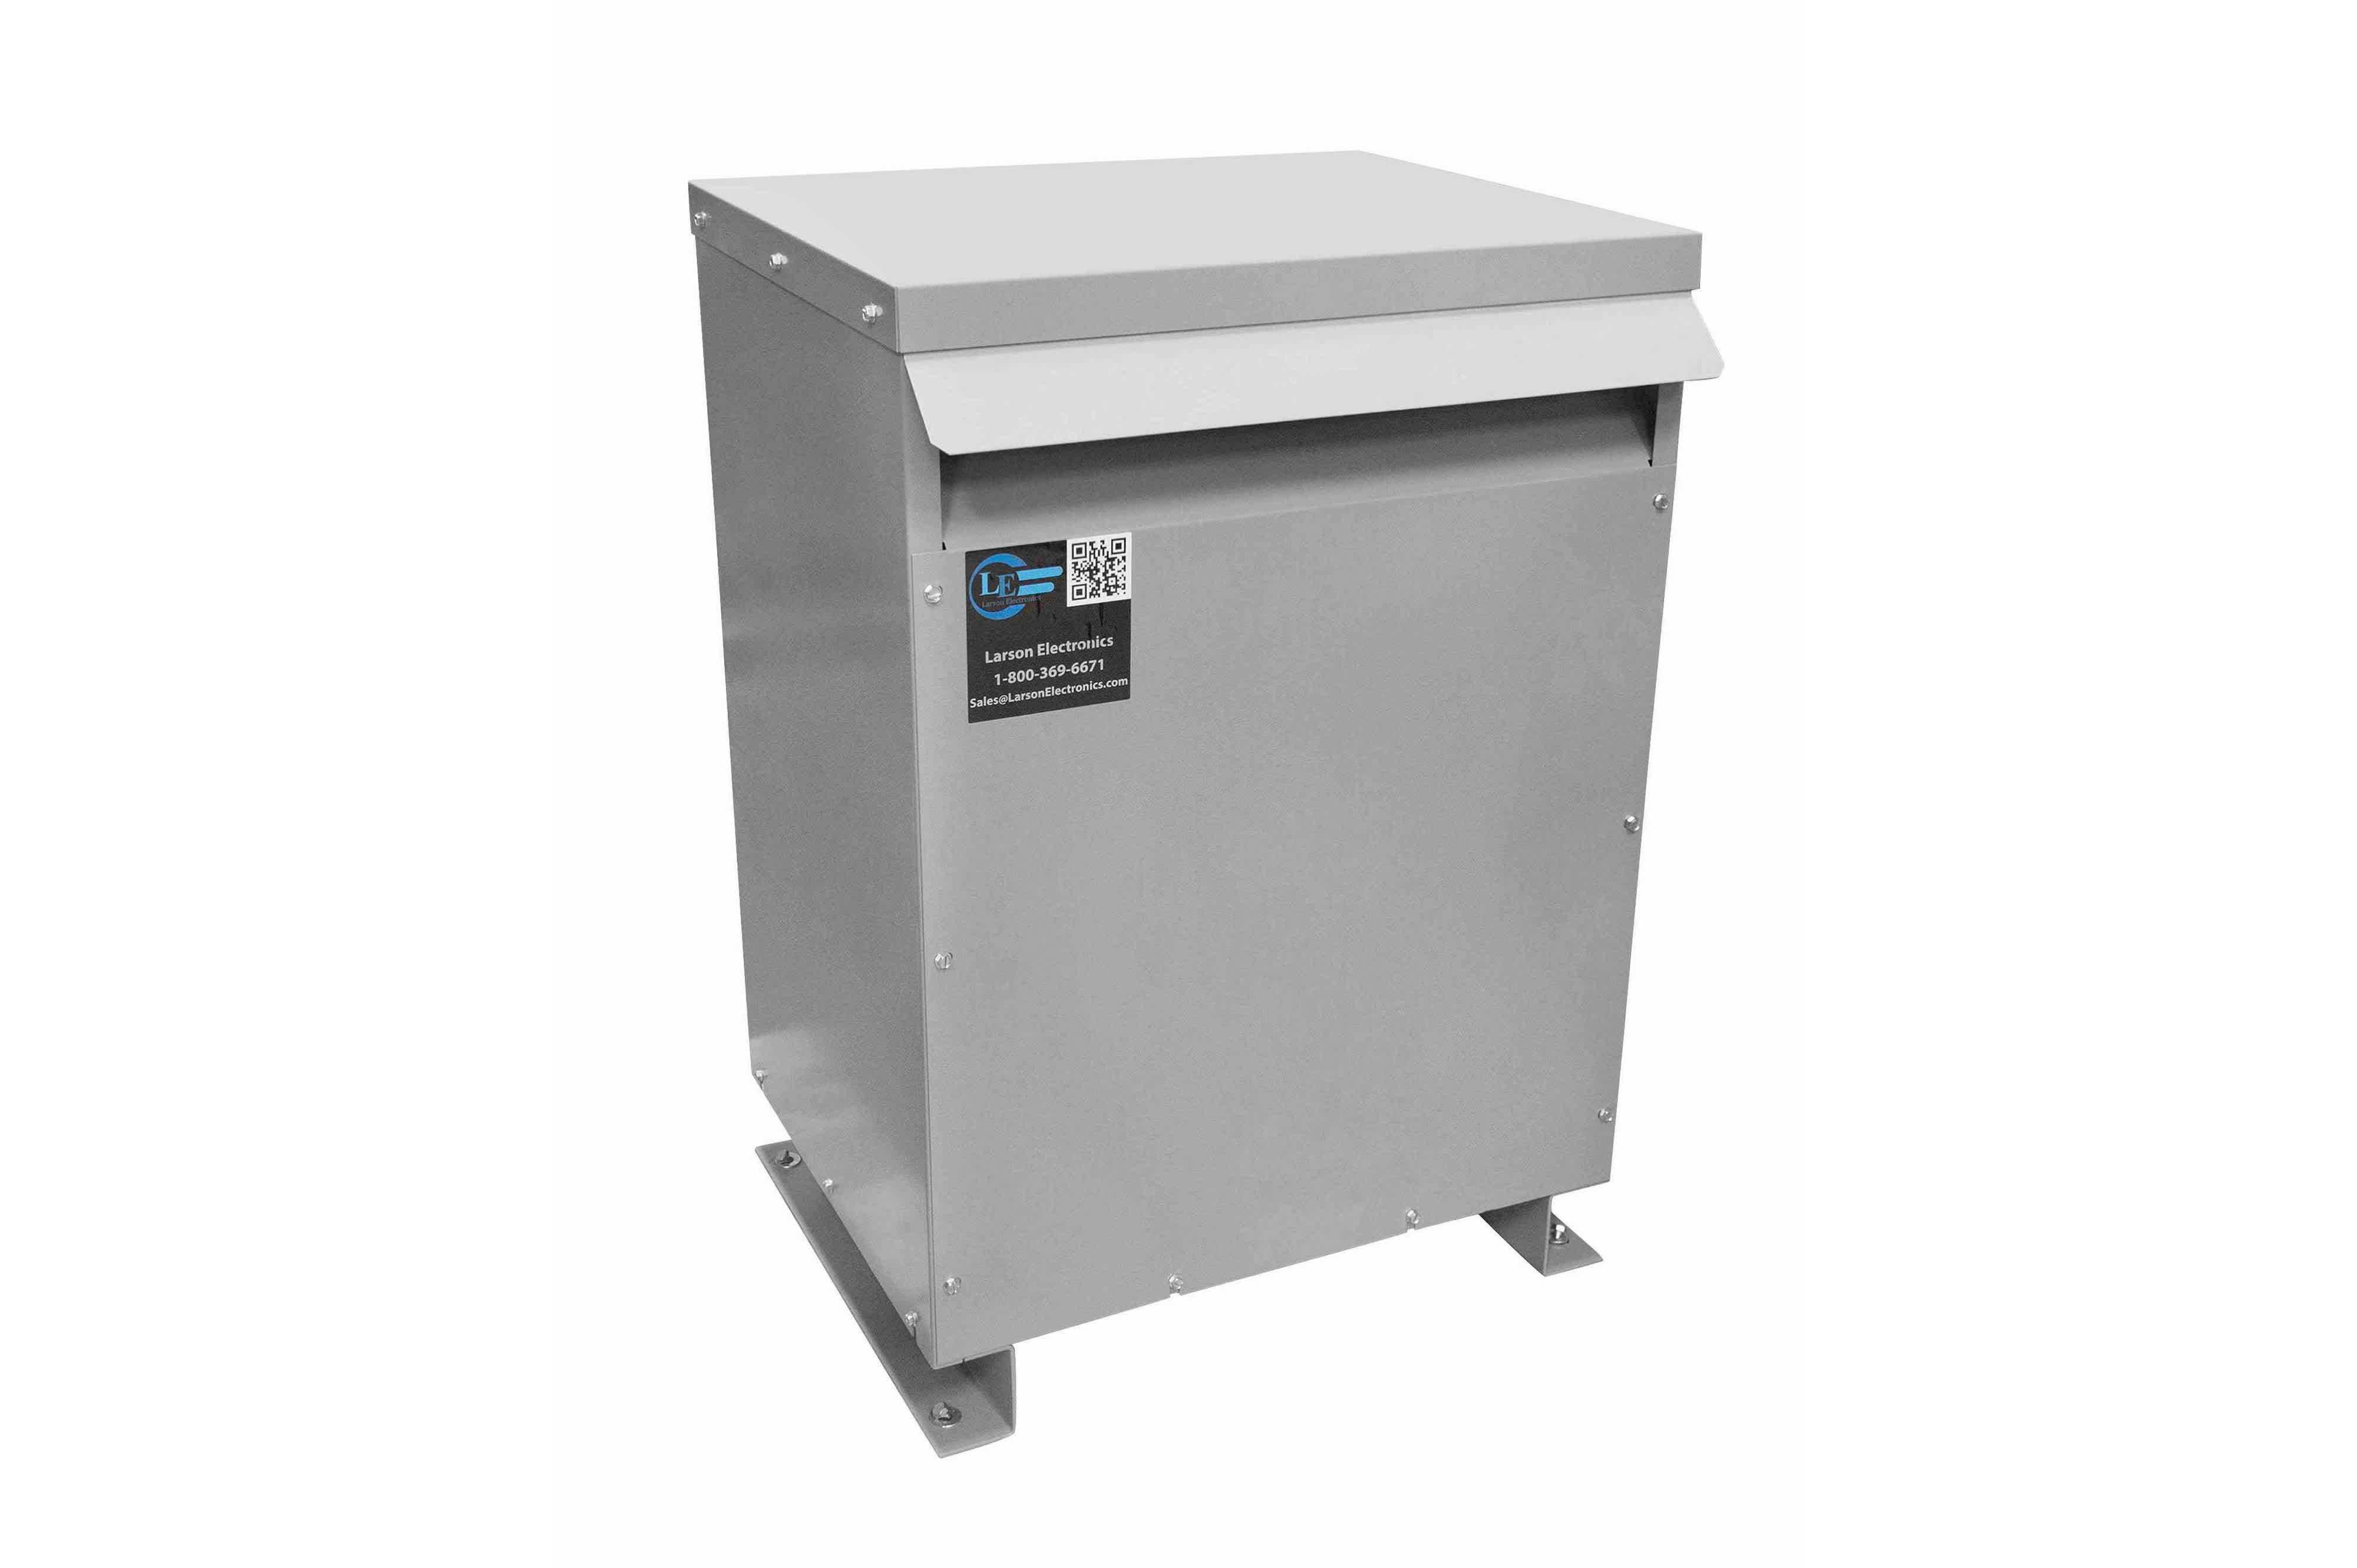 15 kVA 3PH Isolation Transformer, 480V Wye Primary, 575Y/332 Wye-N Secondary, N3R, Ventilated, 60 Hz